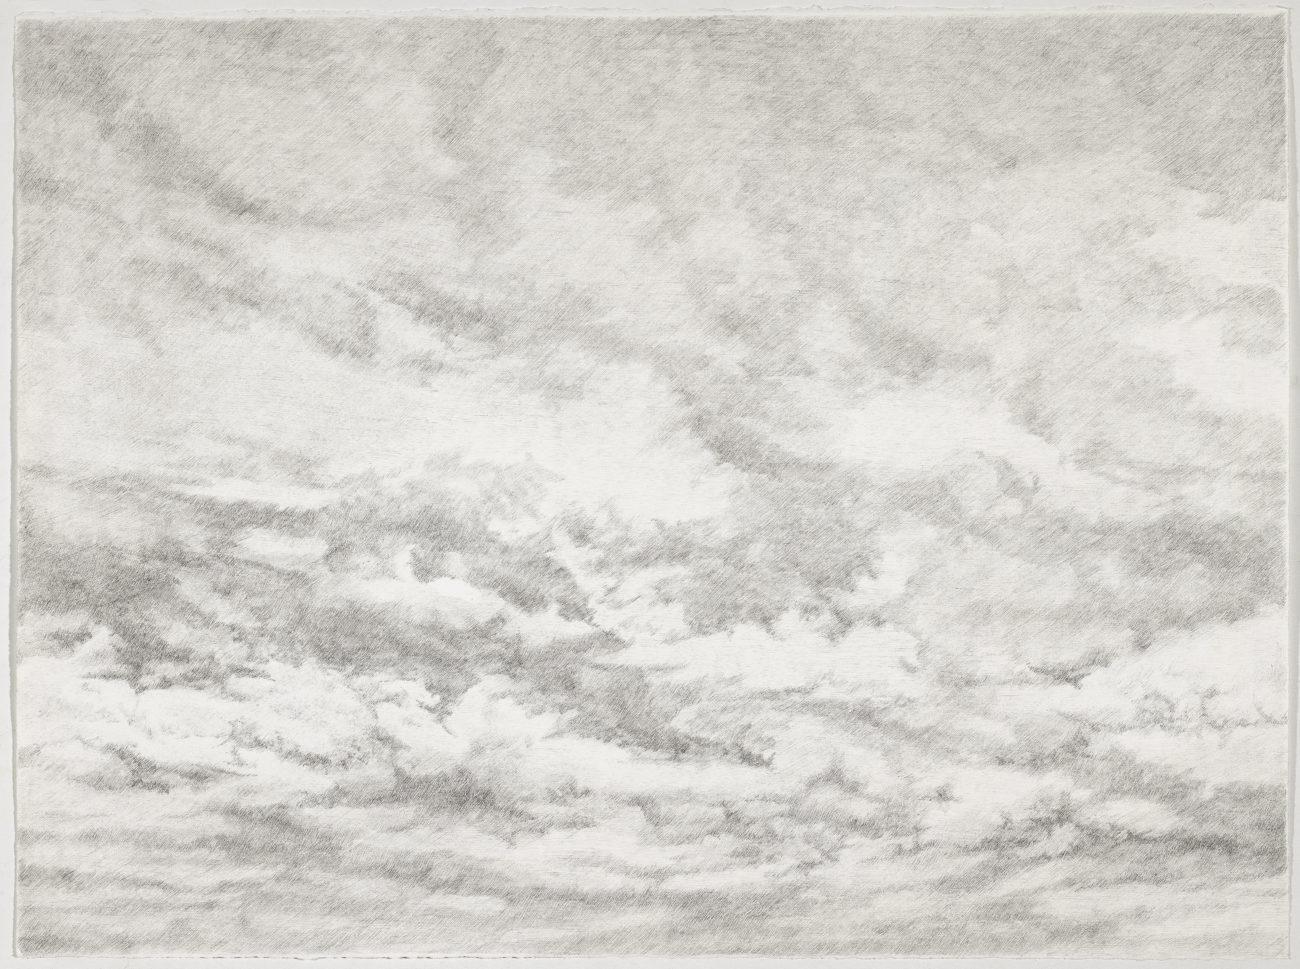 clouds, art, drawing, realistic, art, contemporary, black, xhite, ink, landscape, henninger